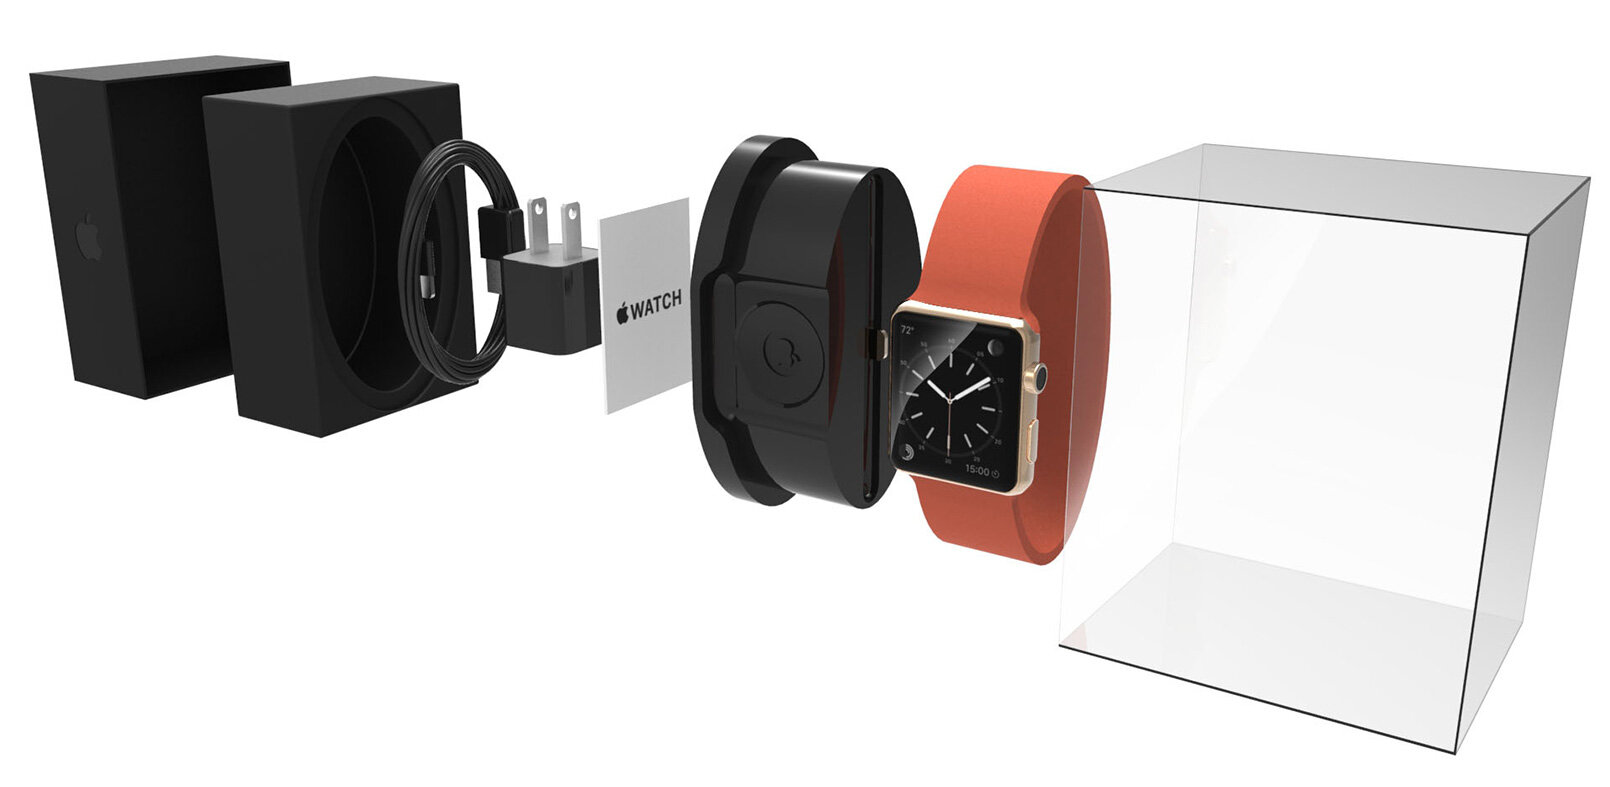 Apple-Watch-Smartwatch-Packaging-Design-Iwatch-Indable-Technology-3.jpg